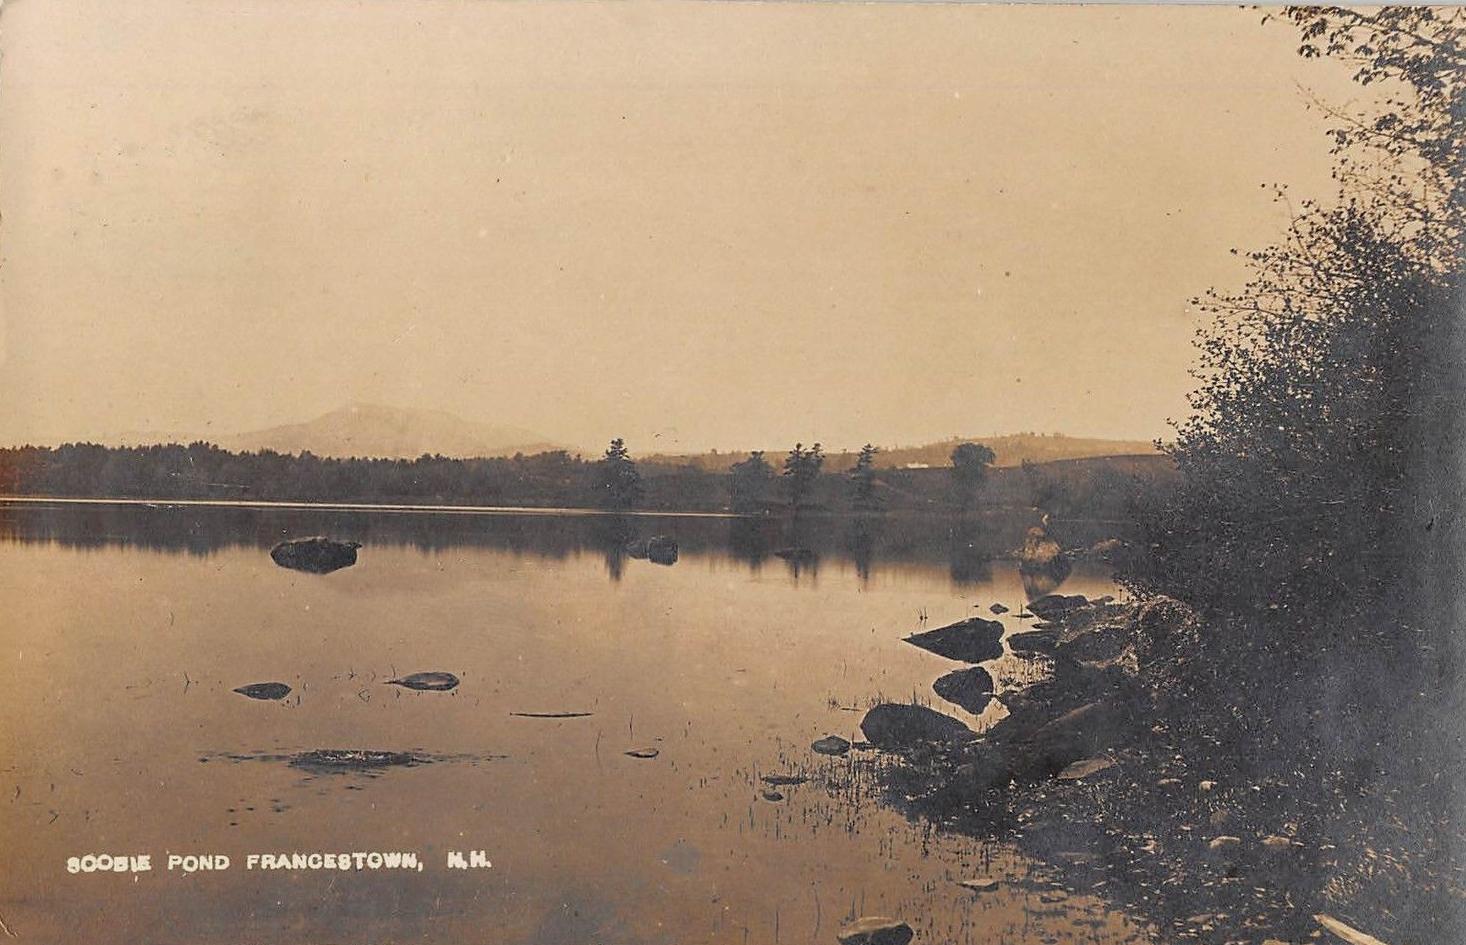 Francestown New Hampshire: Is Haunted Lake Haunted?.